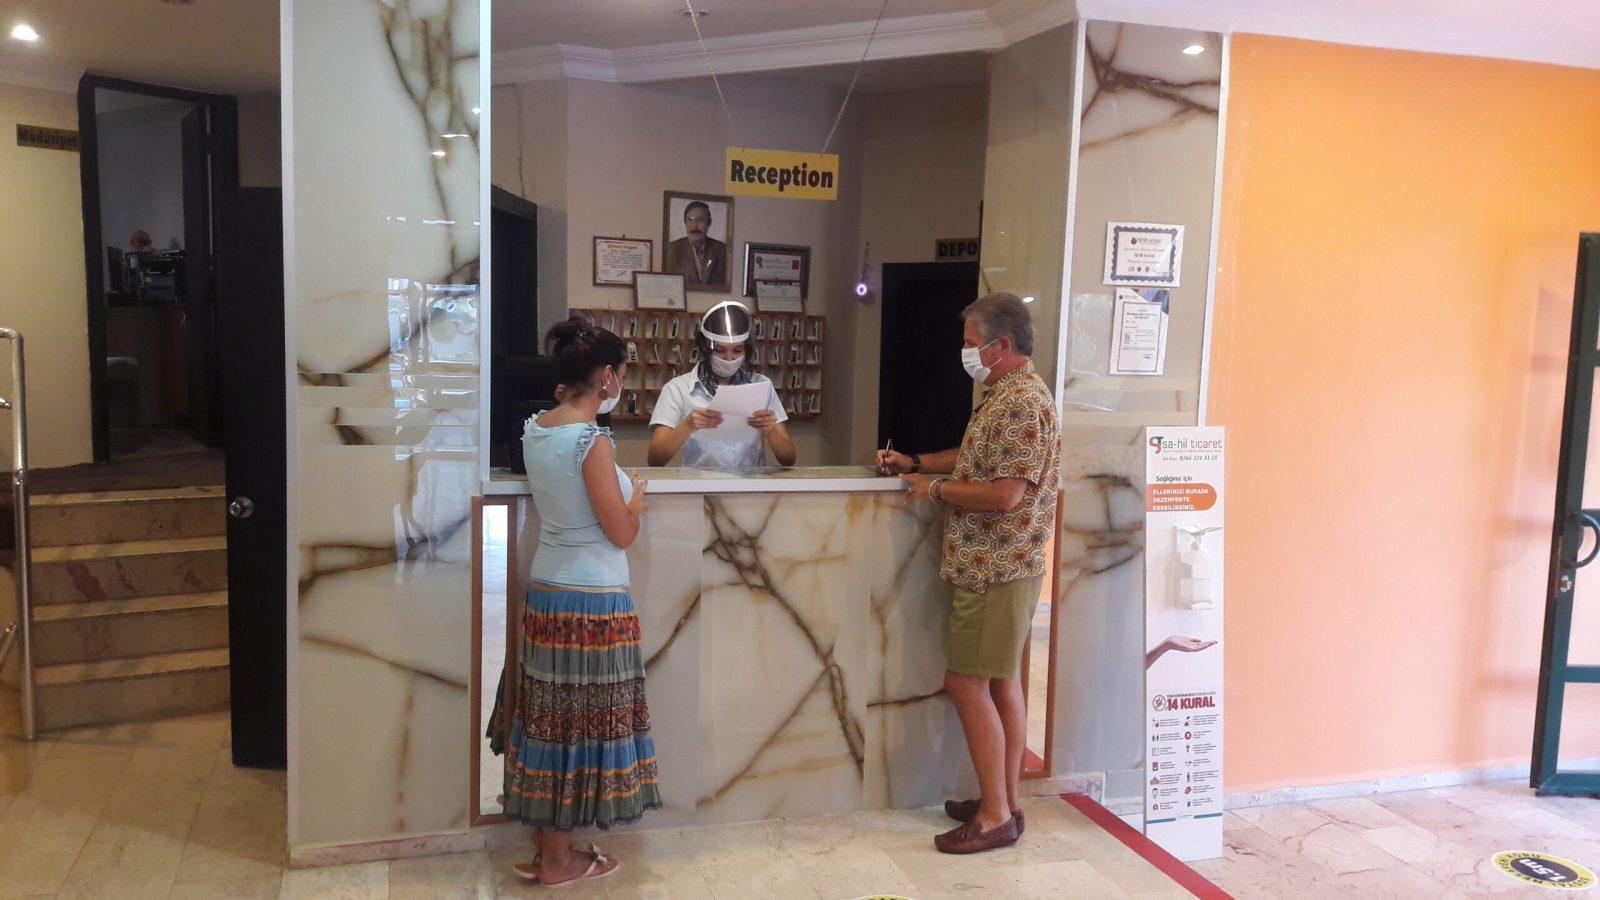 Letovanje Turska autobusom, Sarimsakli, Hotel Urgenc,recepcija